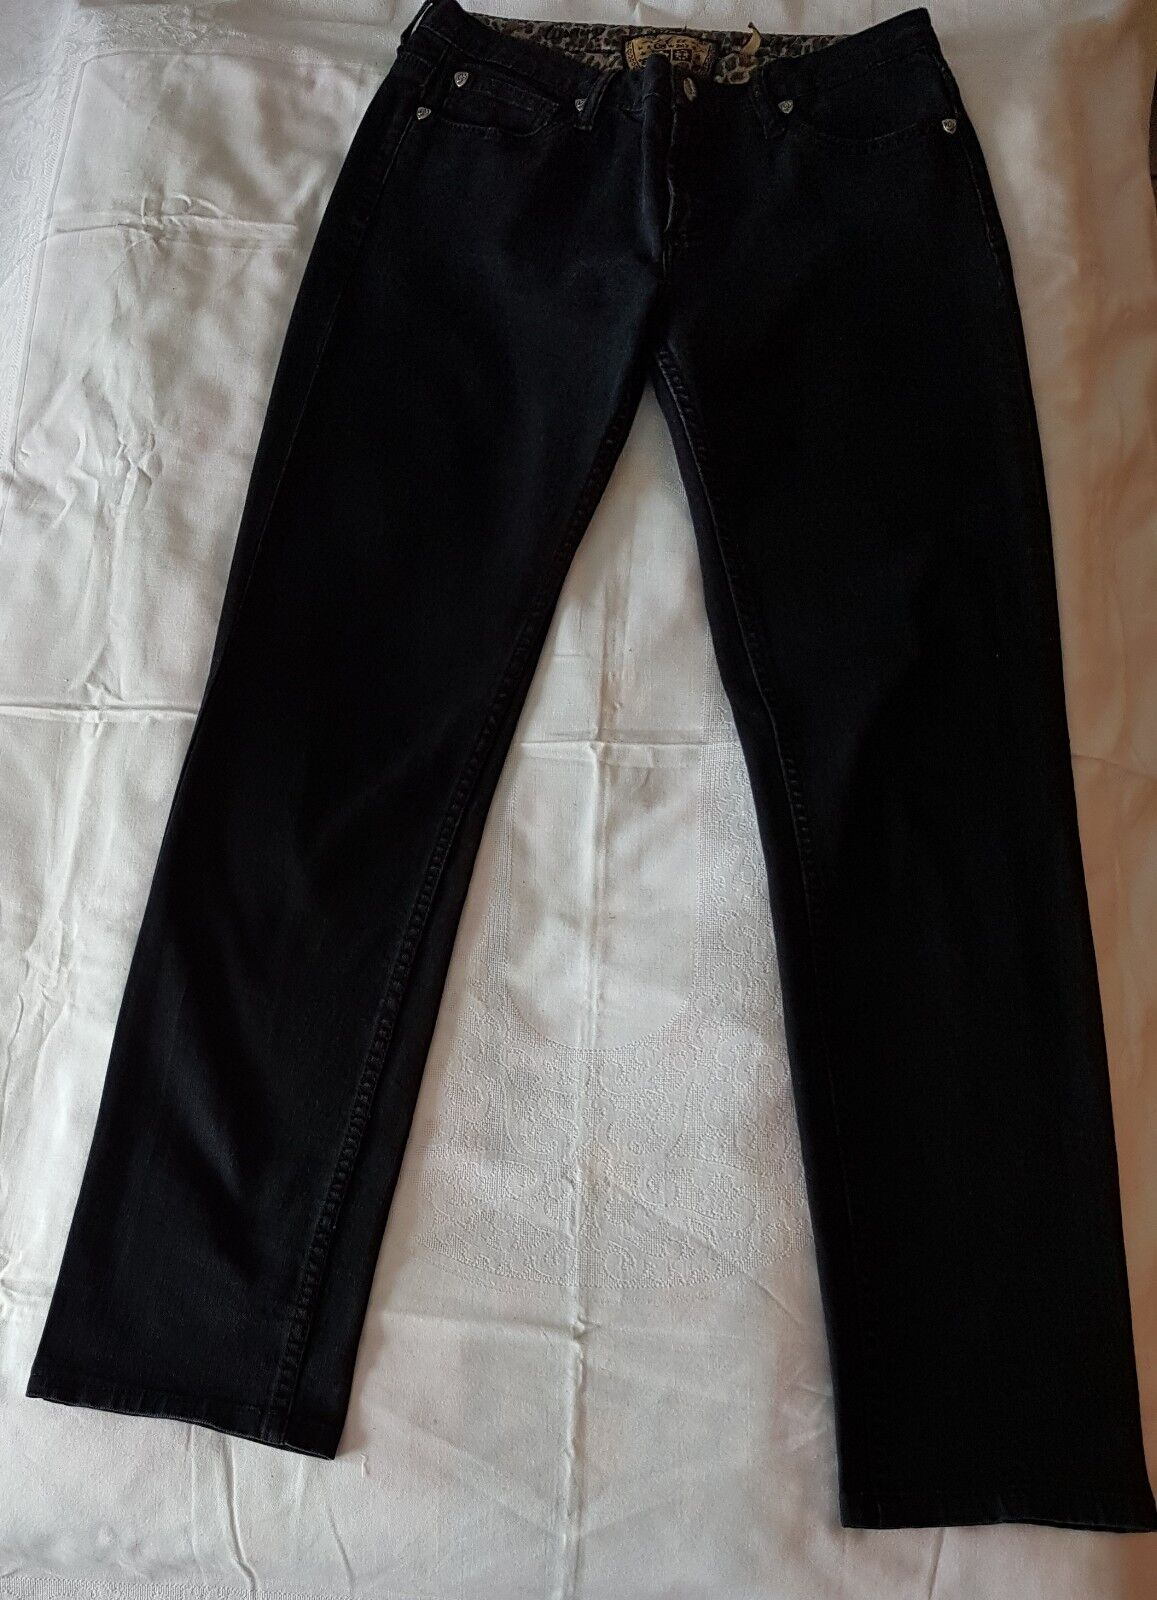 Schwarze Jeans von Blau L.A., Grace, skinny, W29 L34, Damen